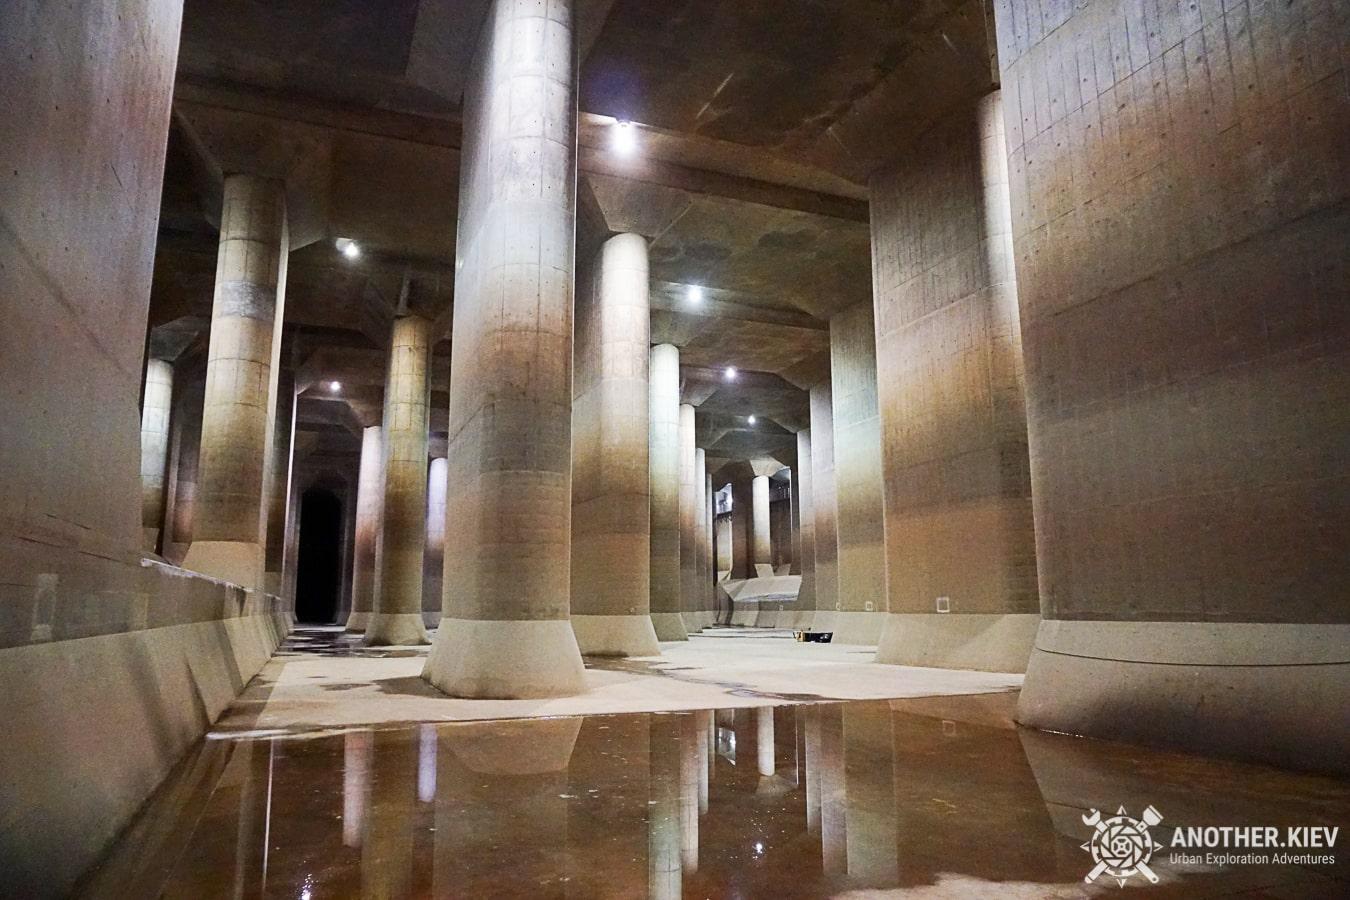 j-cans-urbex-tour-6-min Экскурсия в Токийский противопаводковый коллектор